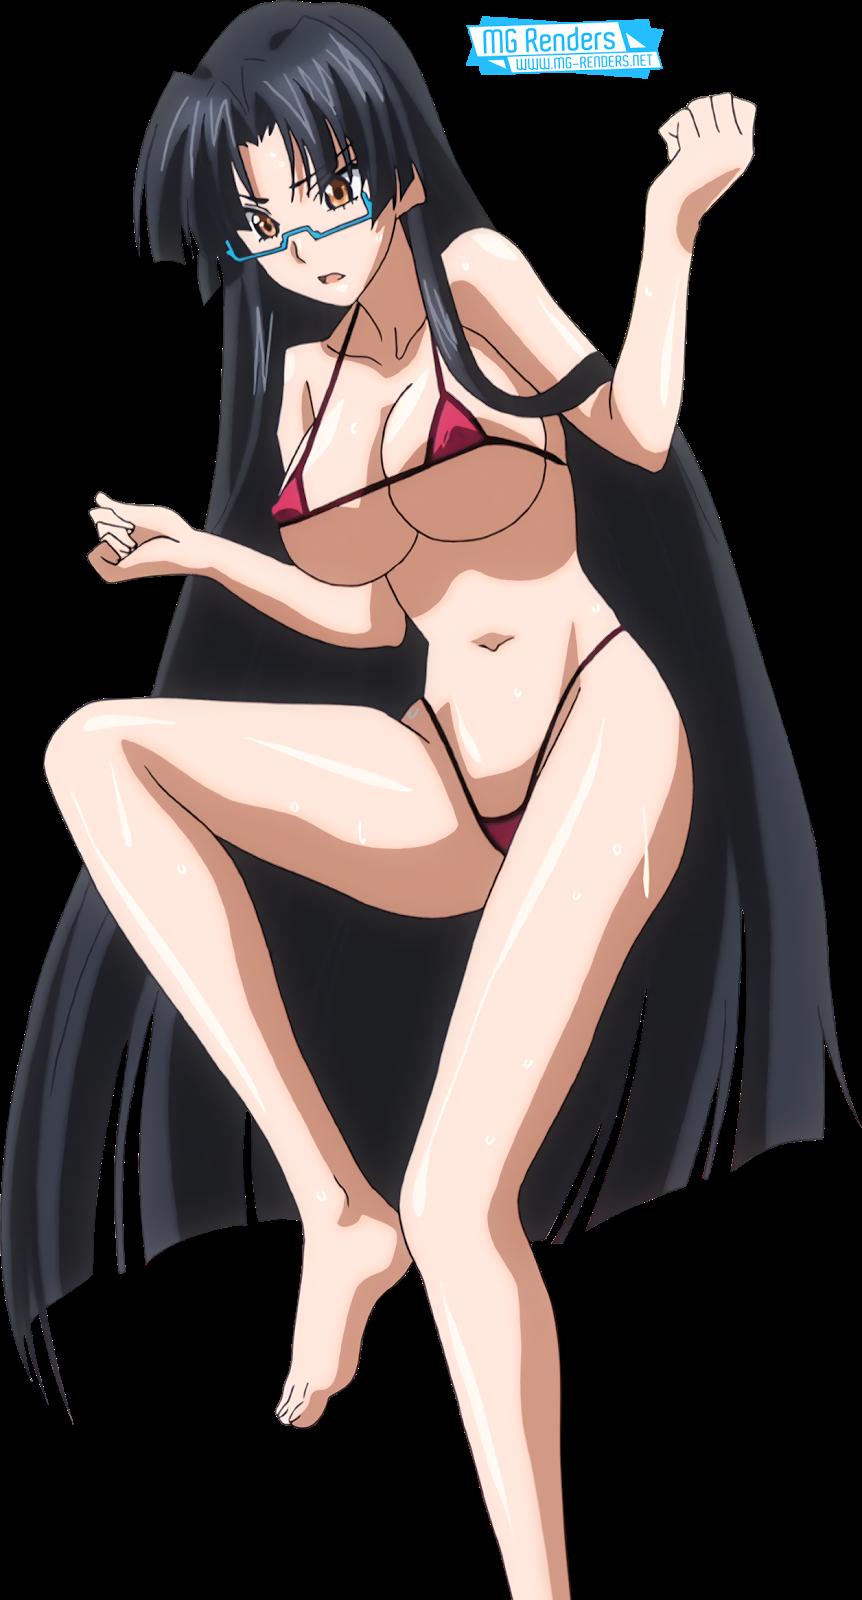 Tags: Render, Barefoot, Bikini, Black hair, Erect nipples, Feet, High School DxD, Huge Breasts, Large Breasts, Long hair, Megane, Shinra Tsubaki, Sling Bikini, Swimsuit, Toes, Very long hair